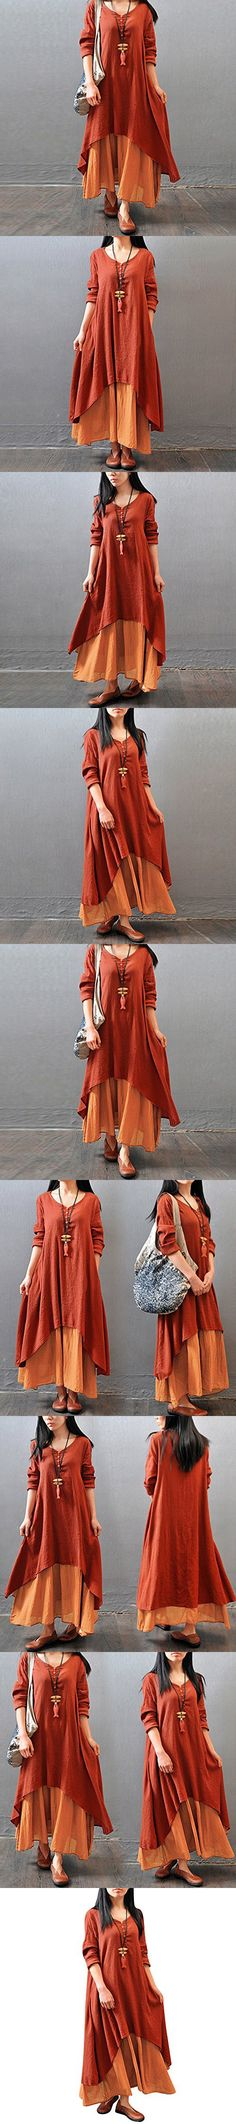 Diamondo New Women Peasant Ethnic Boho Cotton Loose Linen Long Maxi Dress (Brick-Red, Asian XL)